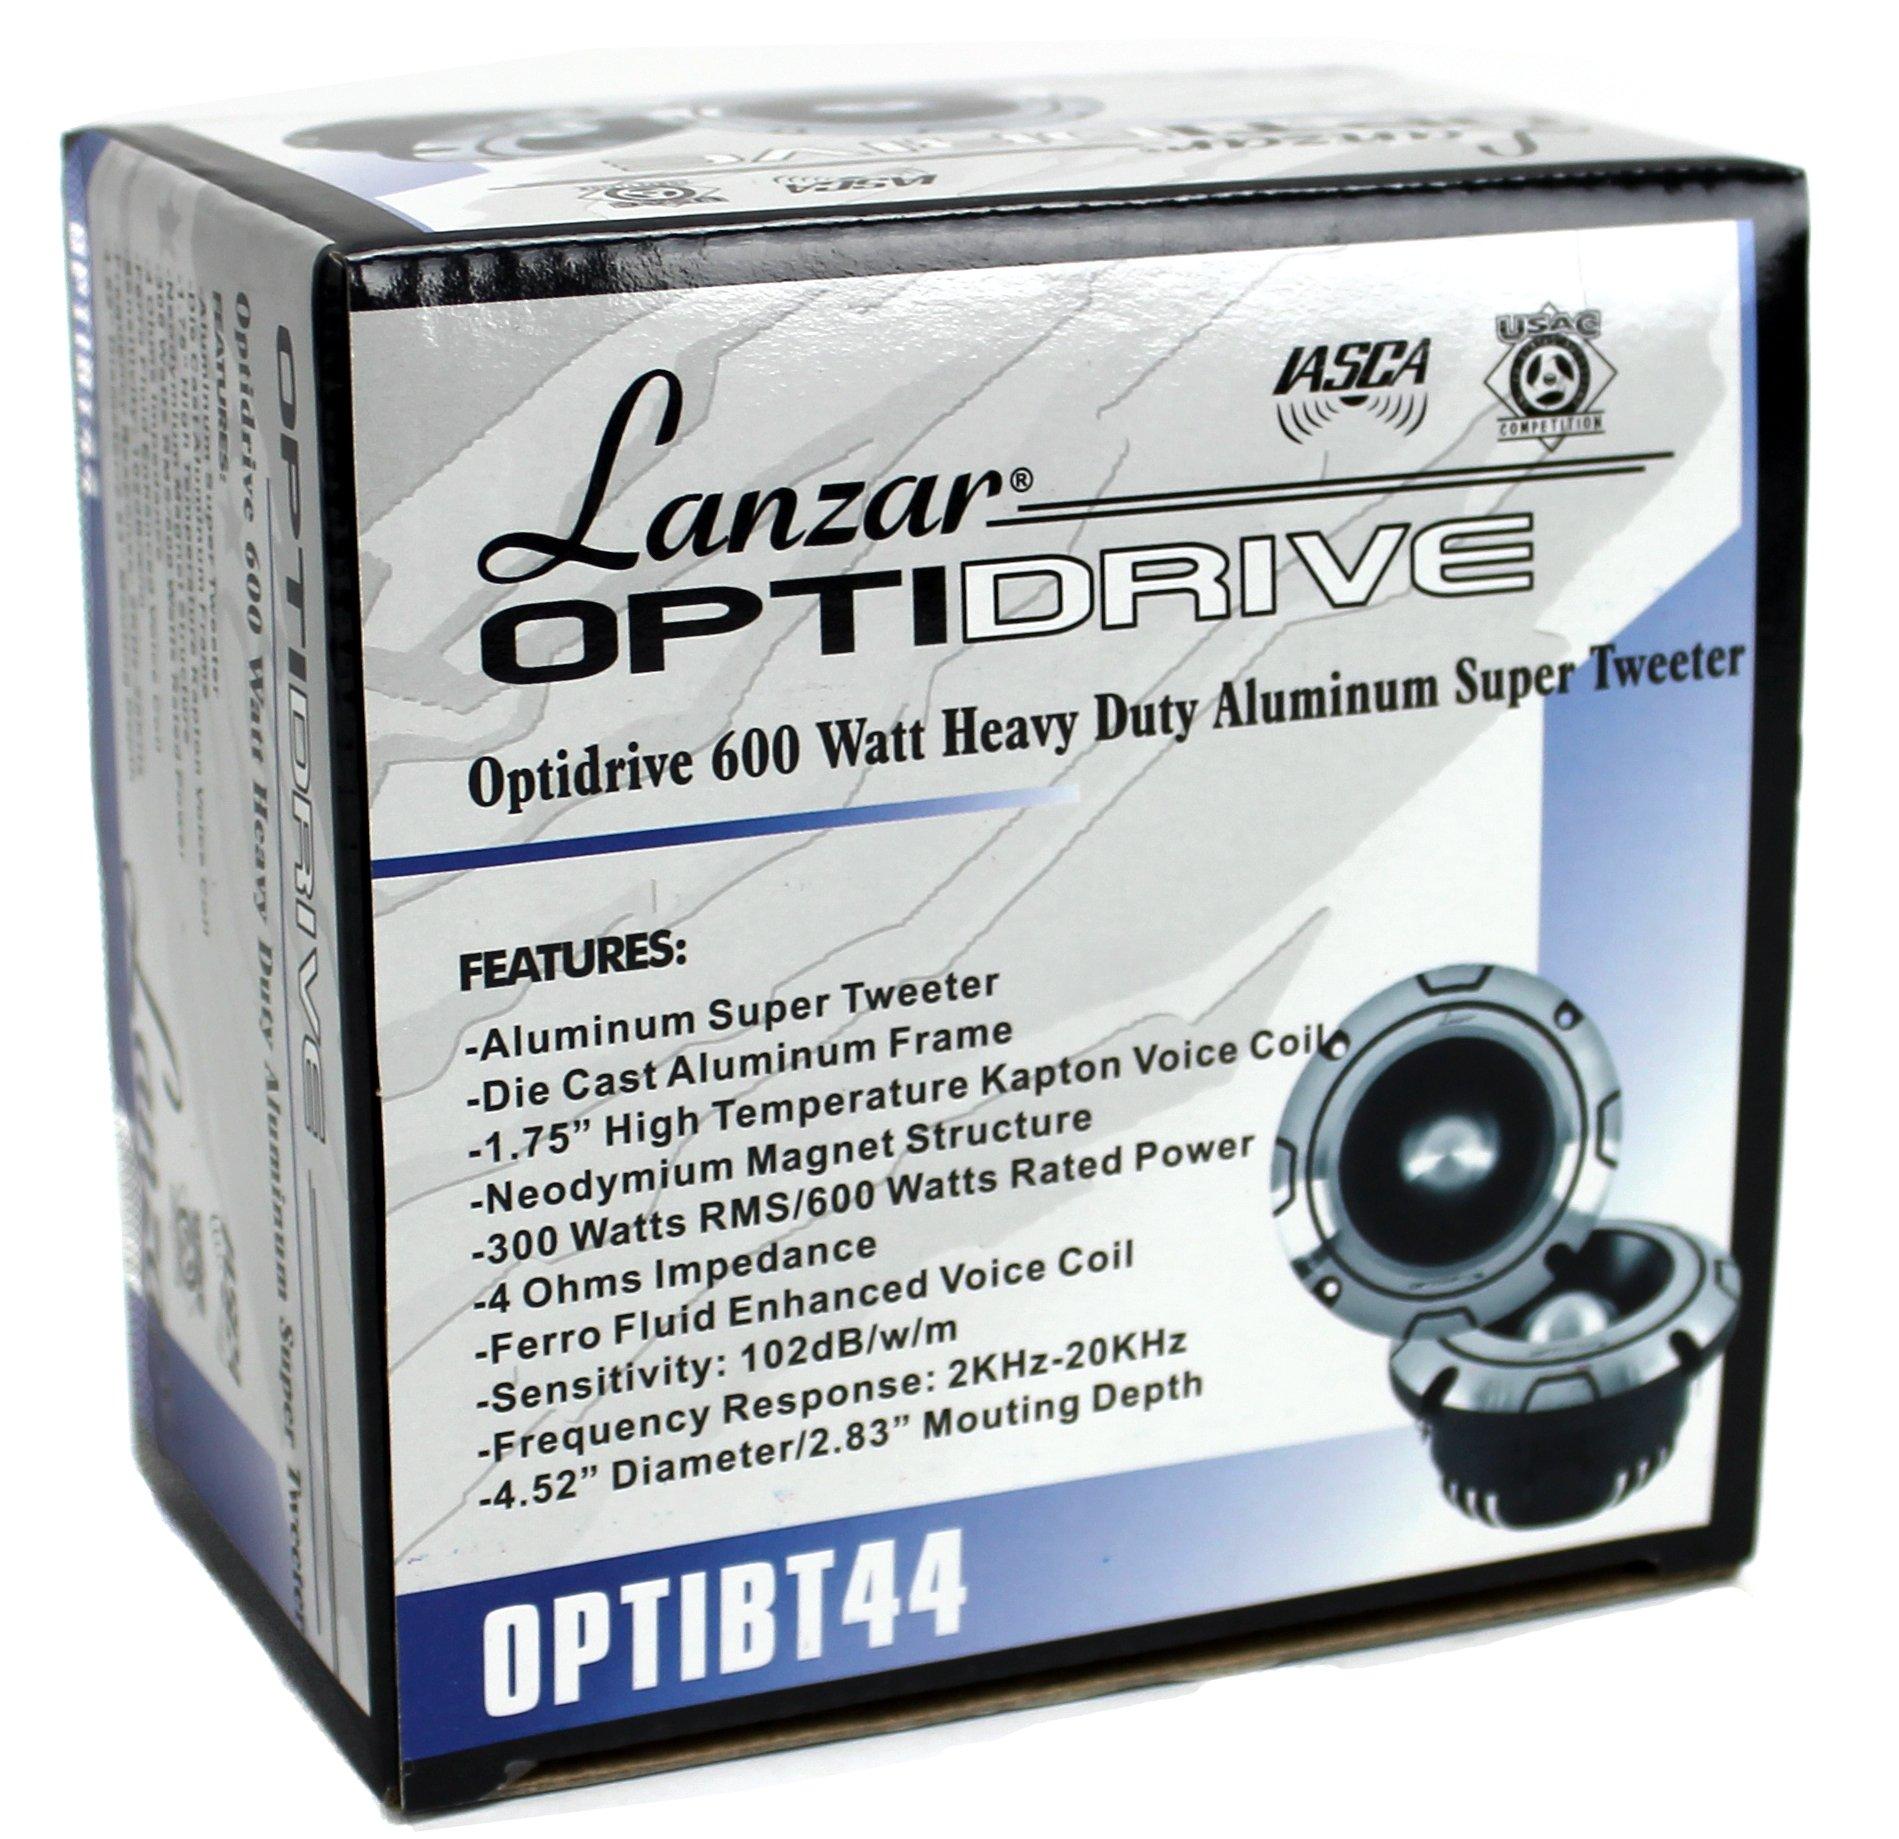 2) NEW LANZAR OPTIBT44 1200W Optidrive Heavy Duty Aluminum Super Bullet Tweeters